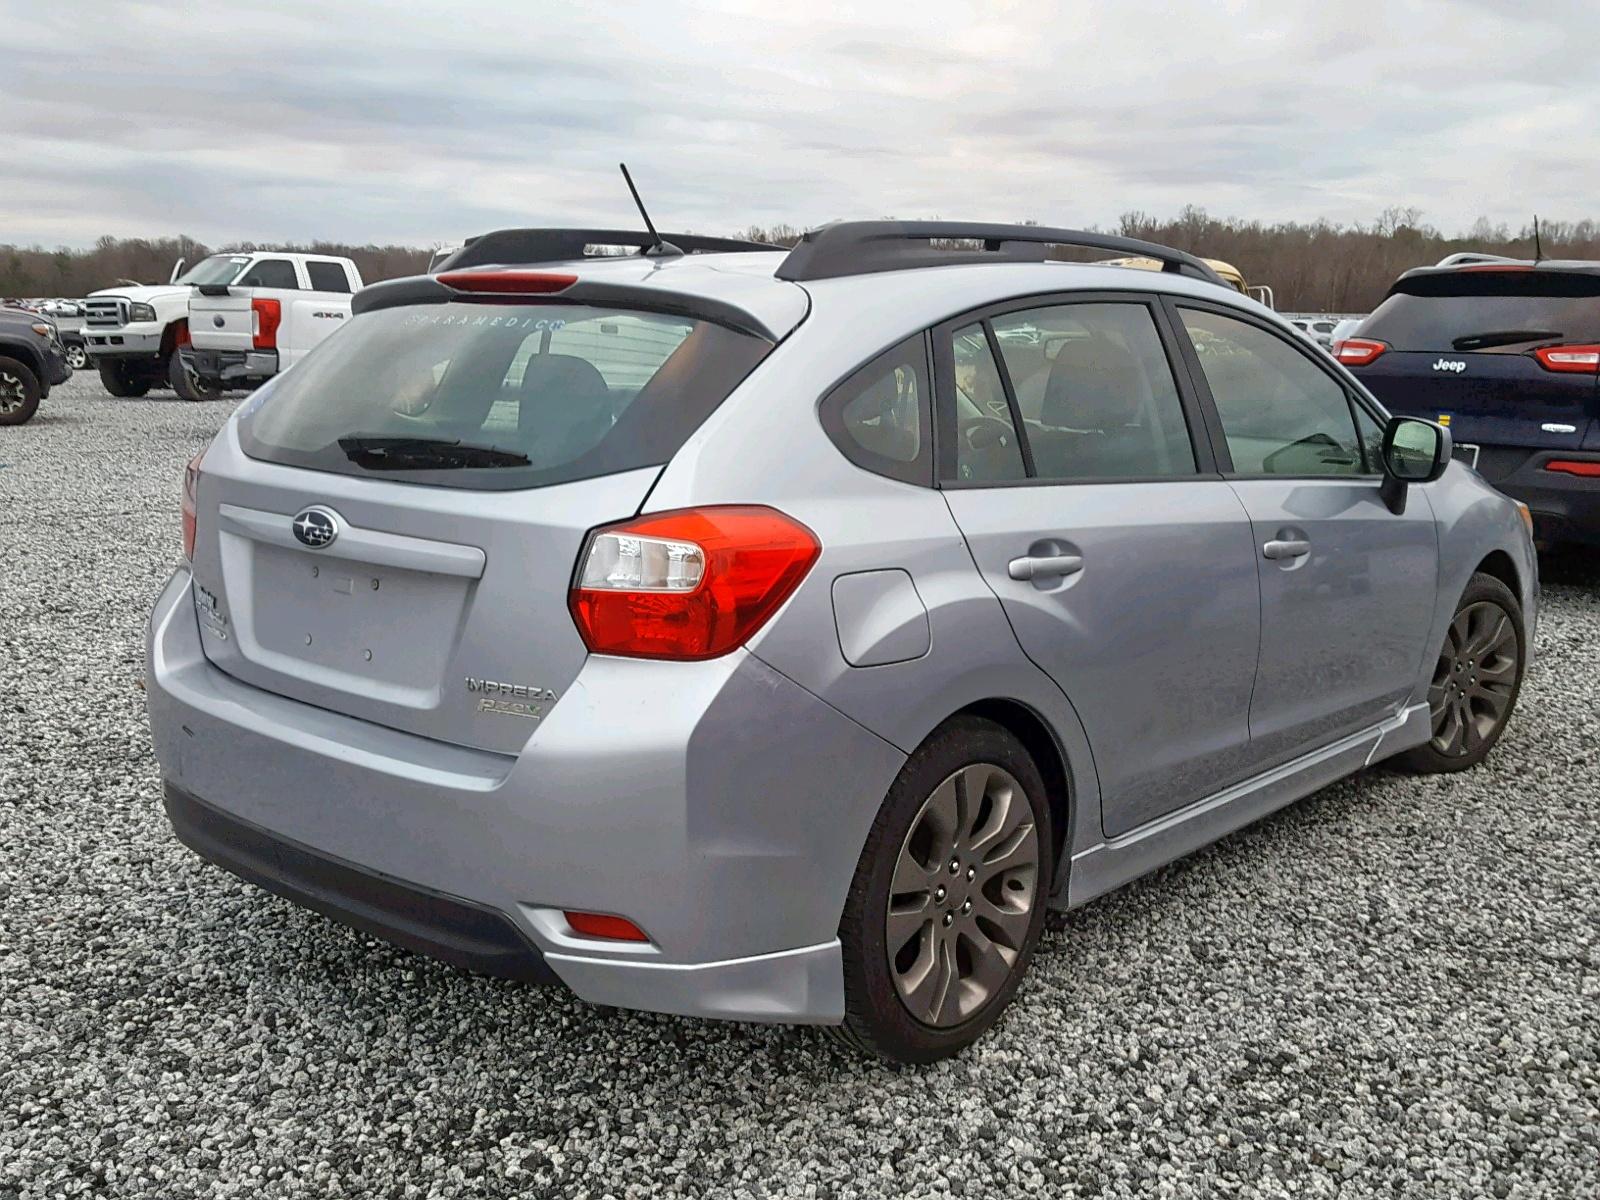 JF1GPAL60DH827185 - 2013 Subaru Impreza Sp 2.0L rear view